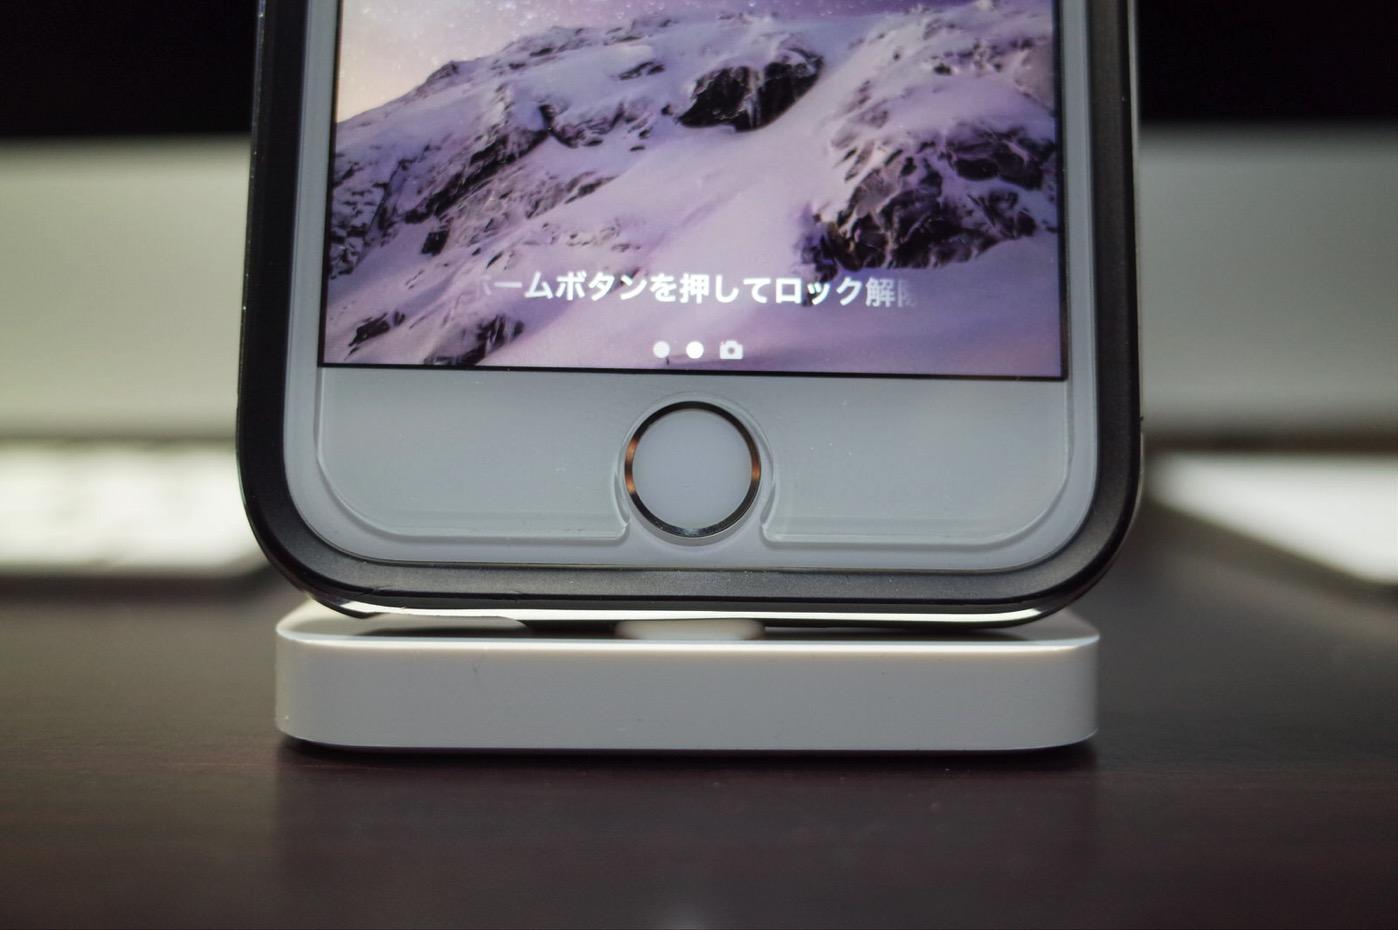 【Spigen】 iPhone7 ケース, ネオ・ハイブリッド [ 米軍MIL規格取得 二重構造 バンパー ] アイフォン 7 用 カバー (iPhone7, ガンメタル)-8